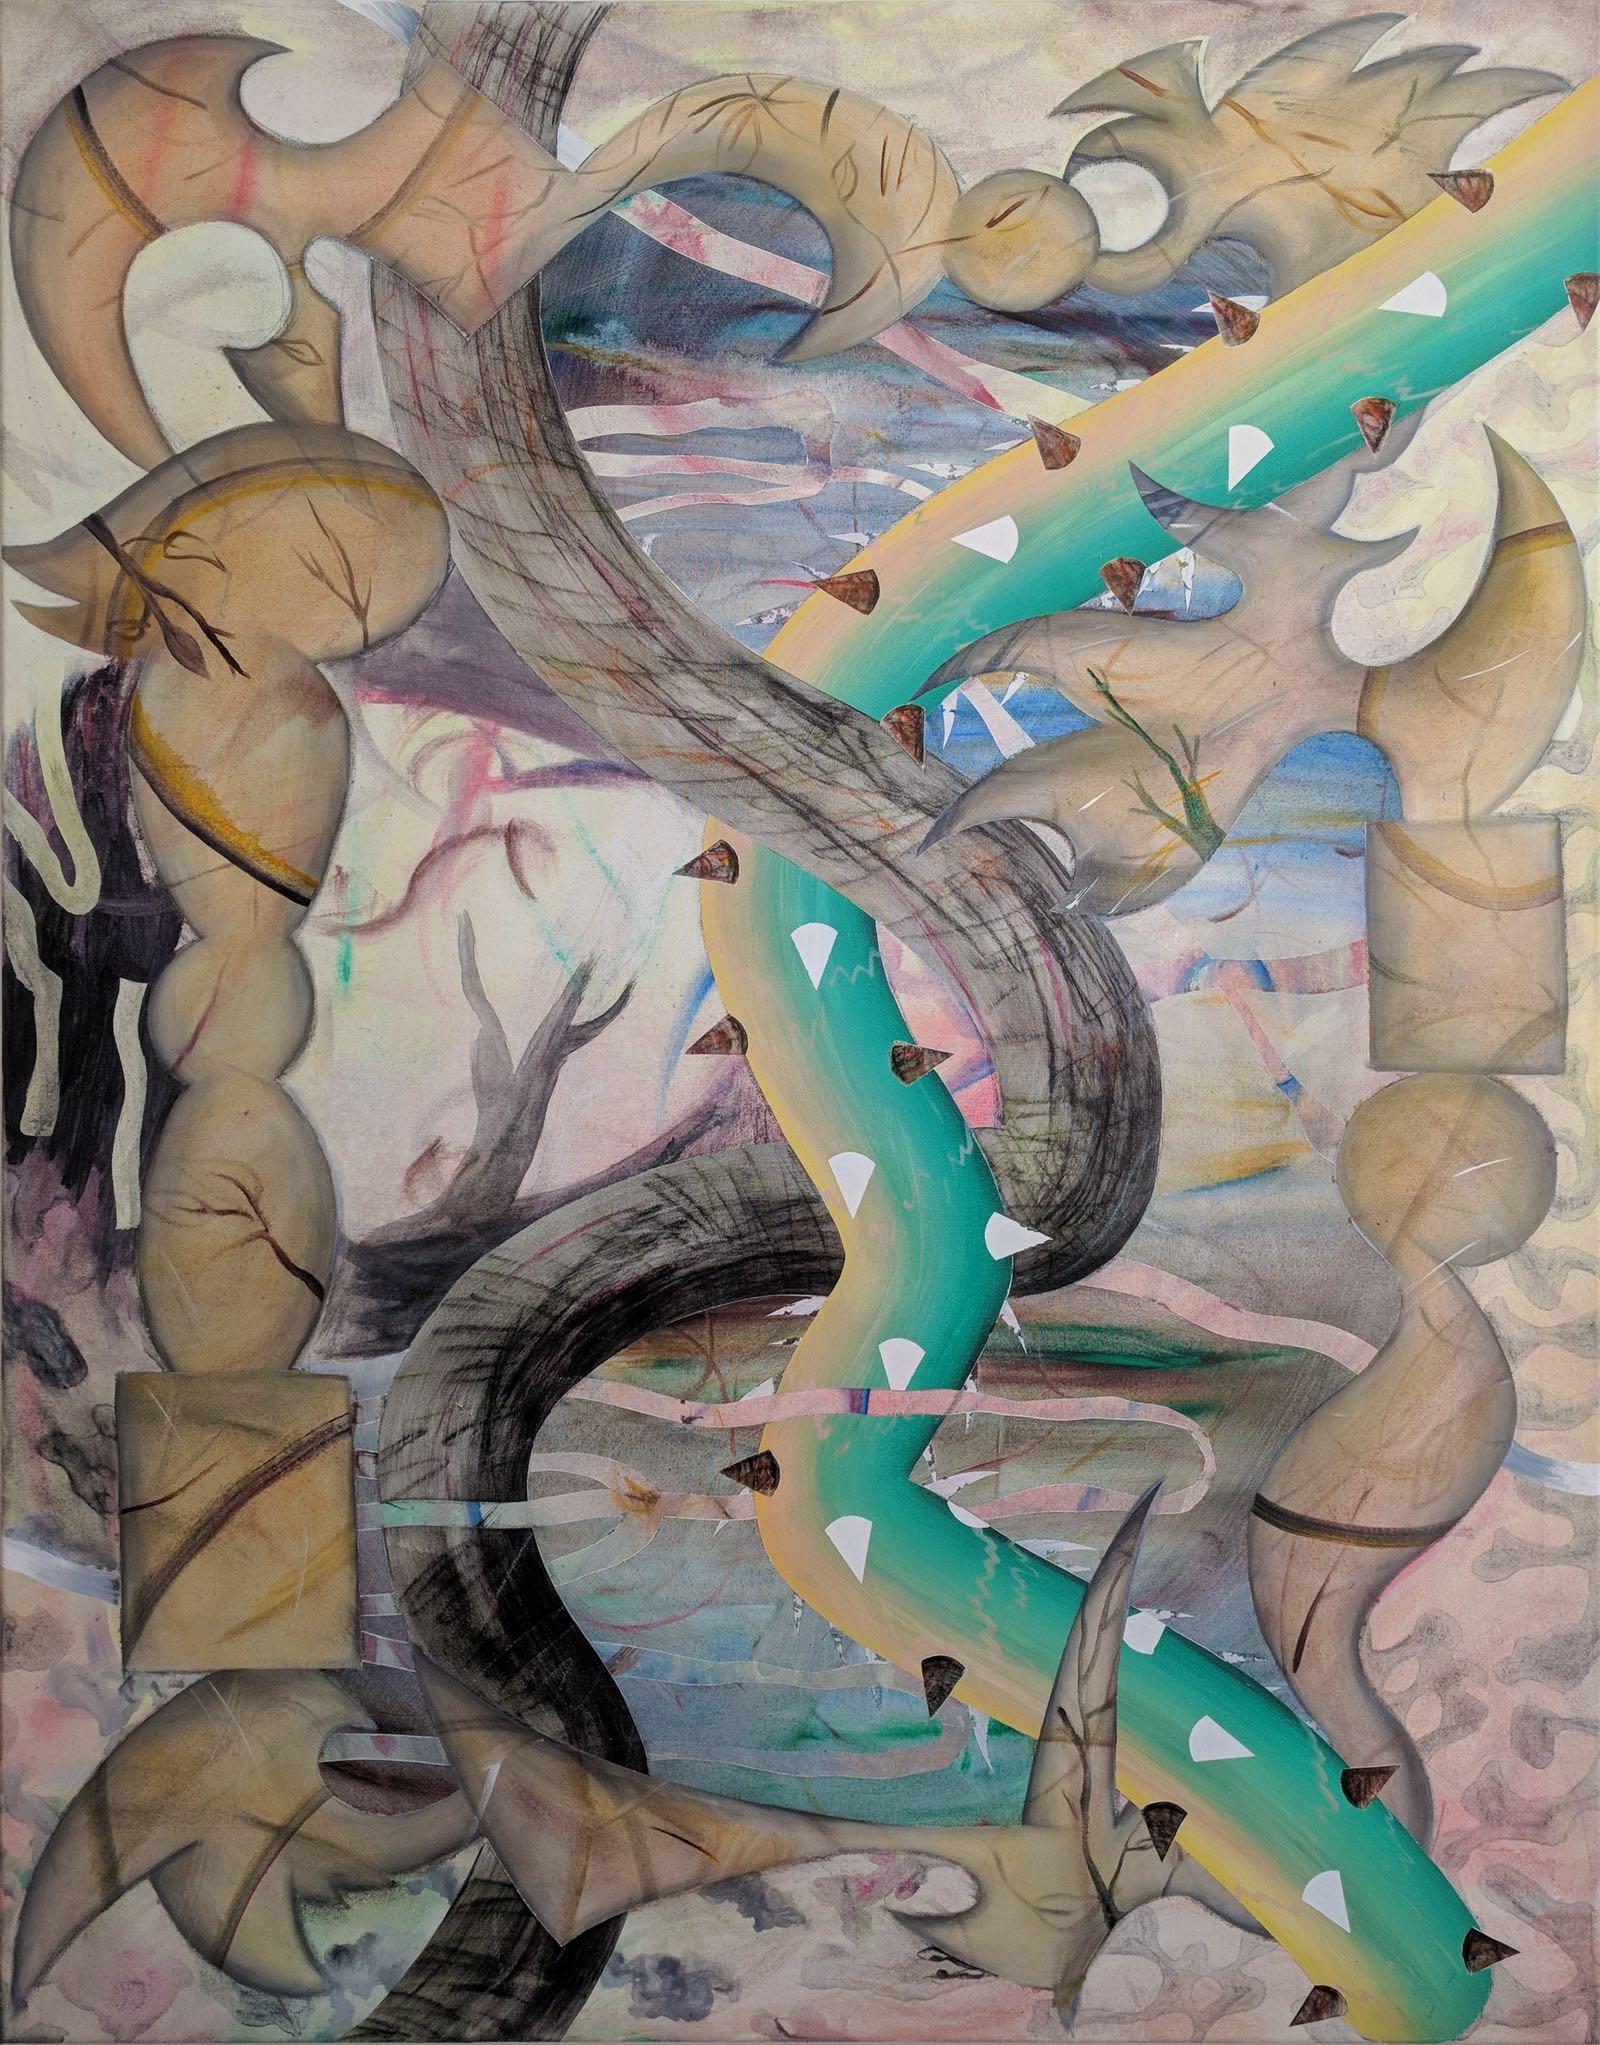 Untitled, 2018, Acryl, Kreide, Öl auf Leinwand,110 x 140 cm.